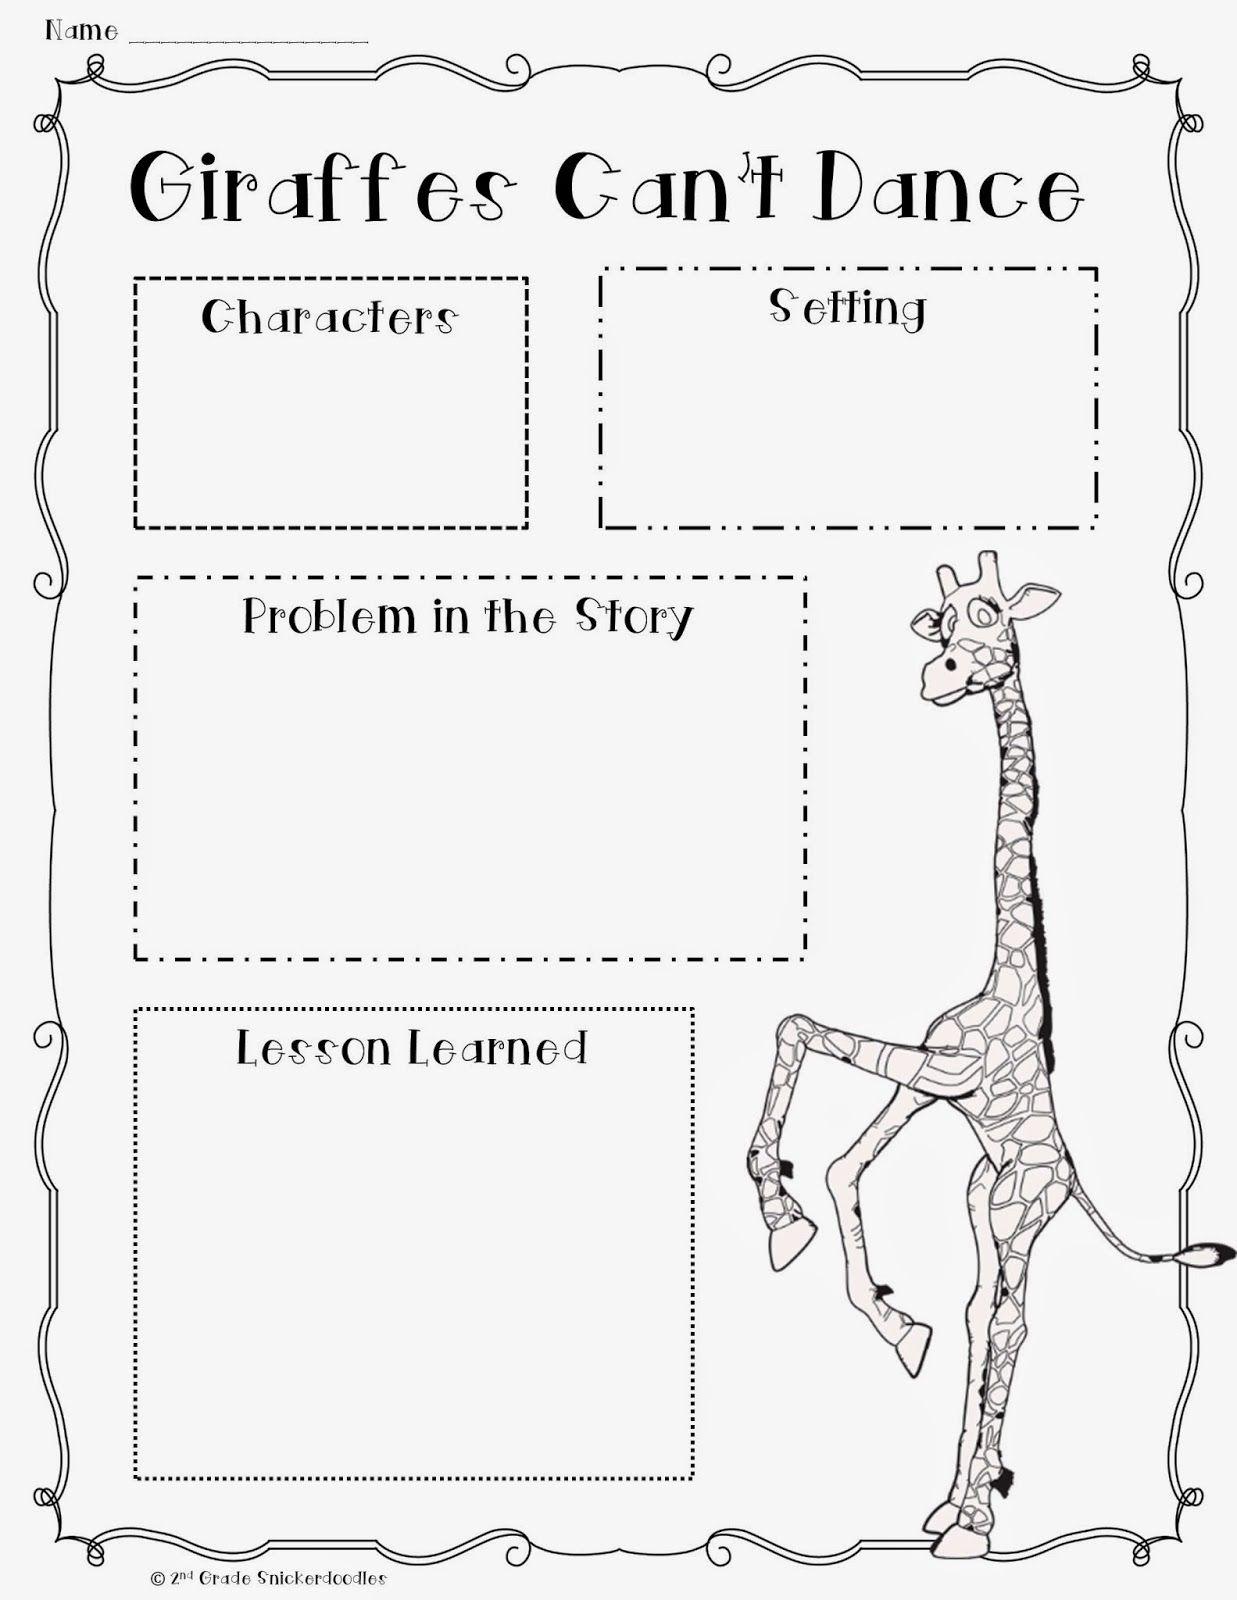 small resolution of 2nd Grade Snickerdoodles: Giraffes Can't Dance Book Chat Fun   Giraffes  cant dance